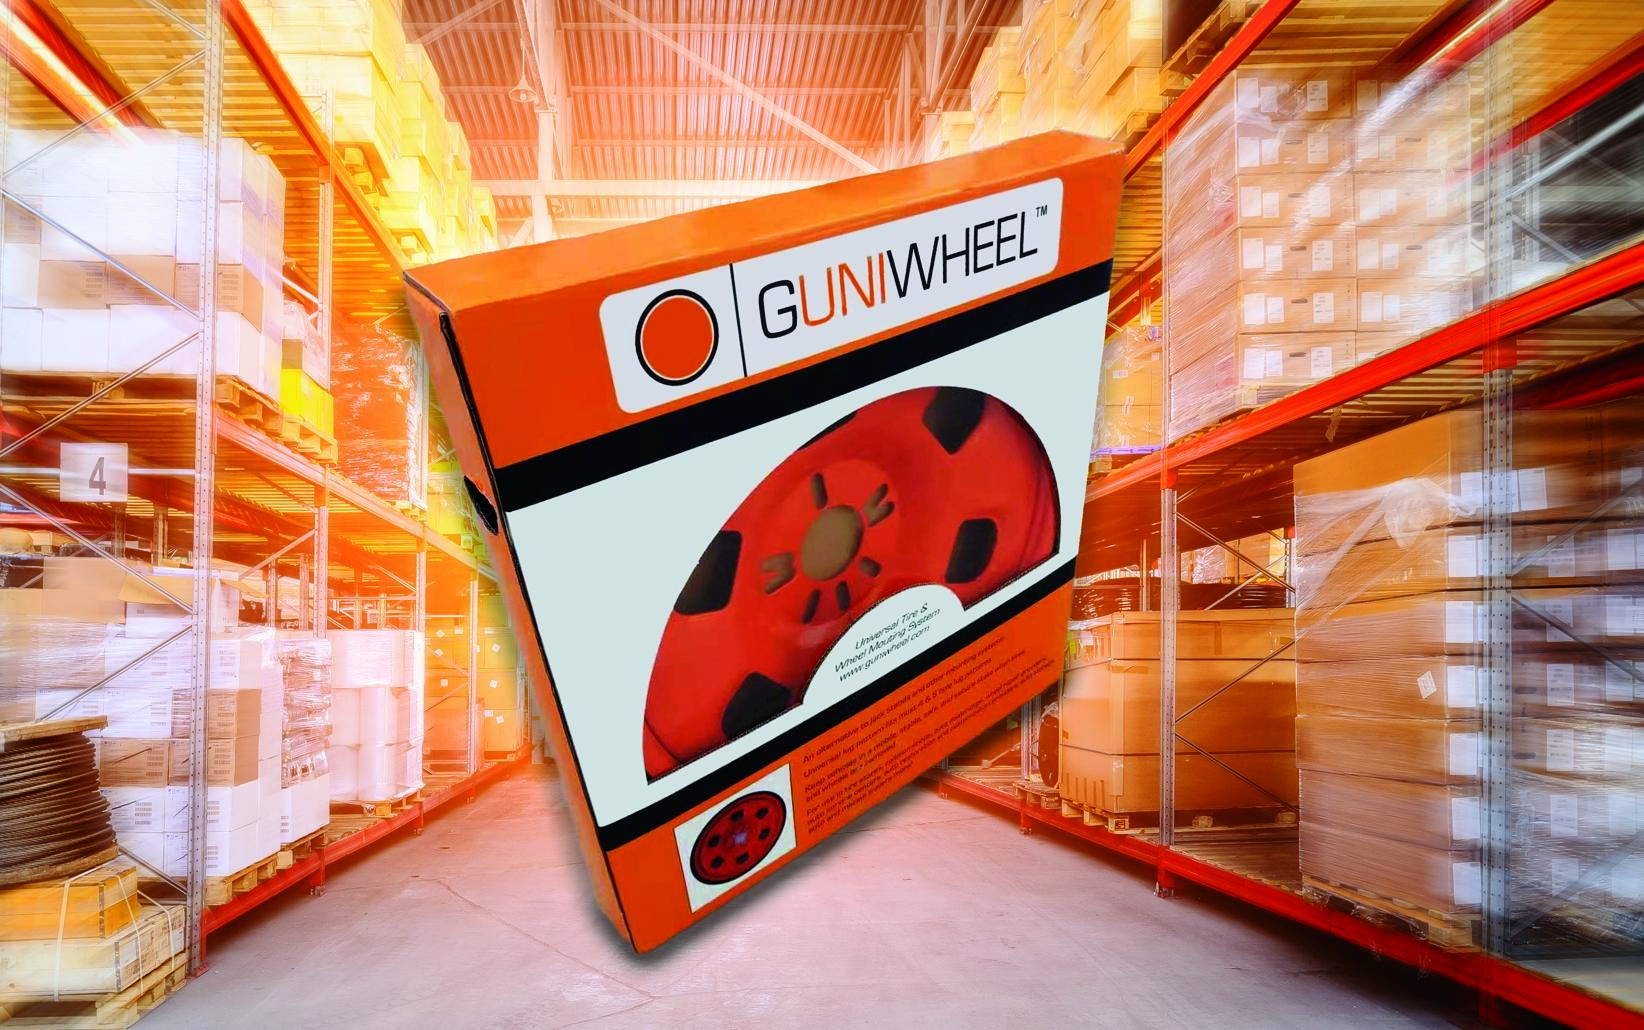 Guni Flyer - MFE Distribution Oppo V2.jpg